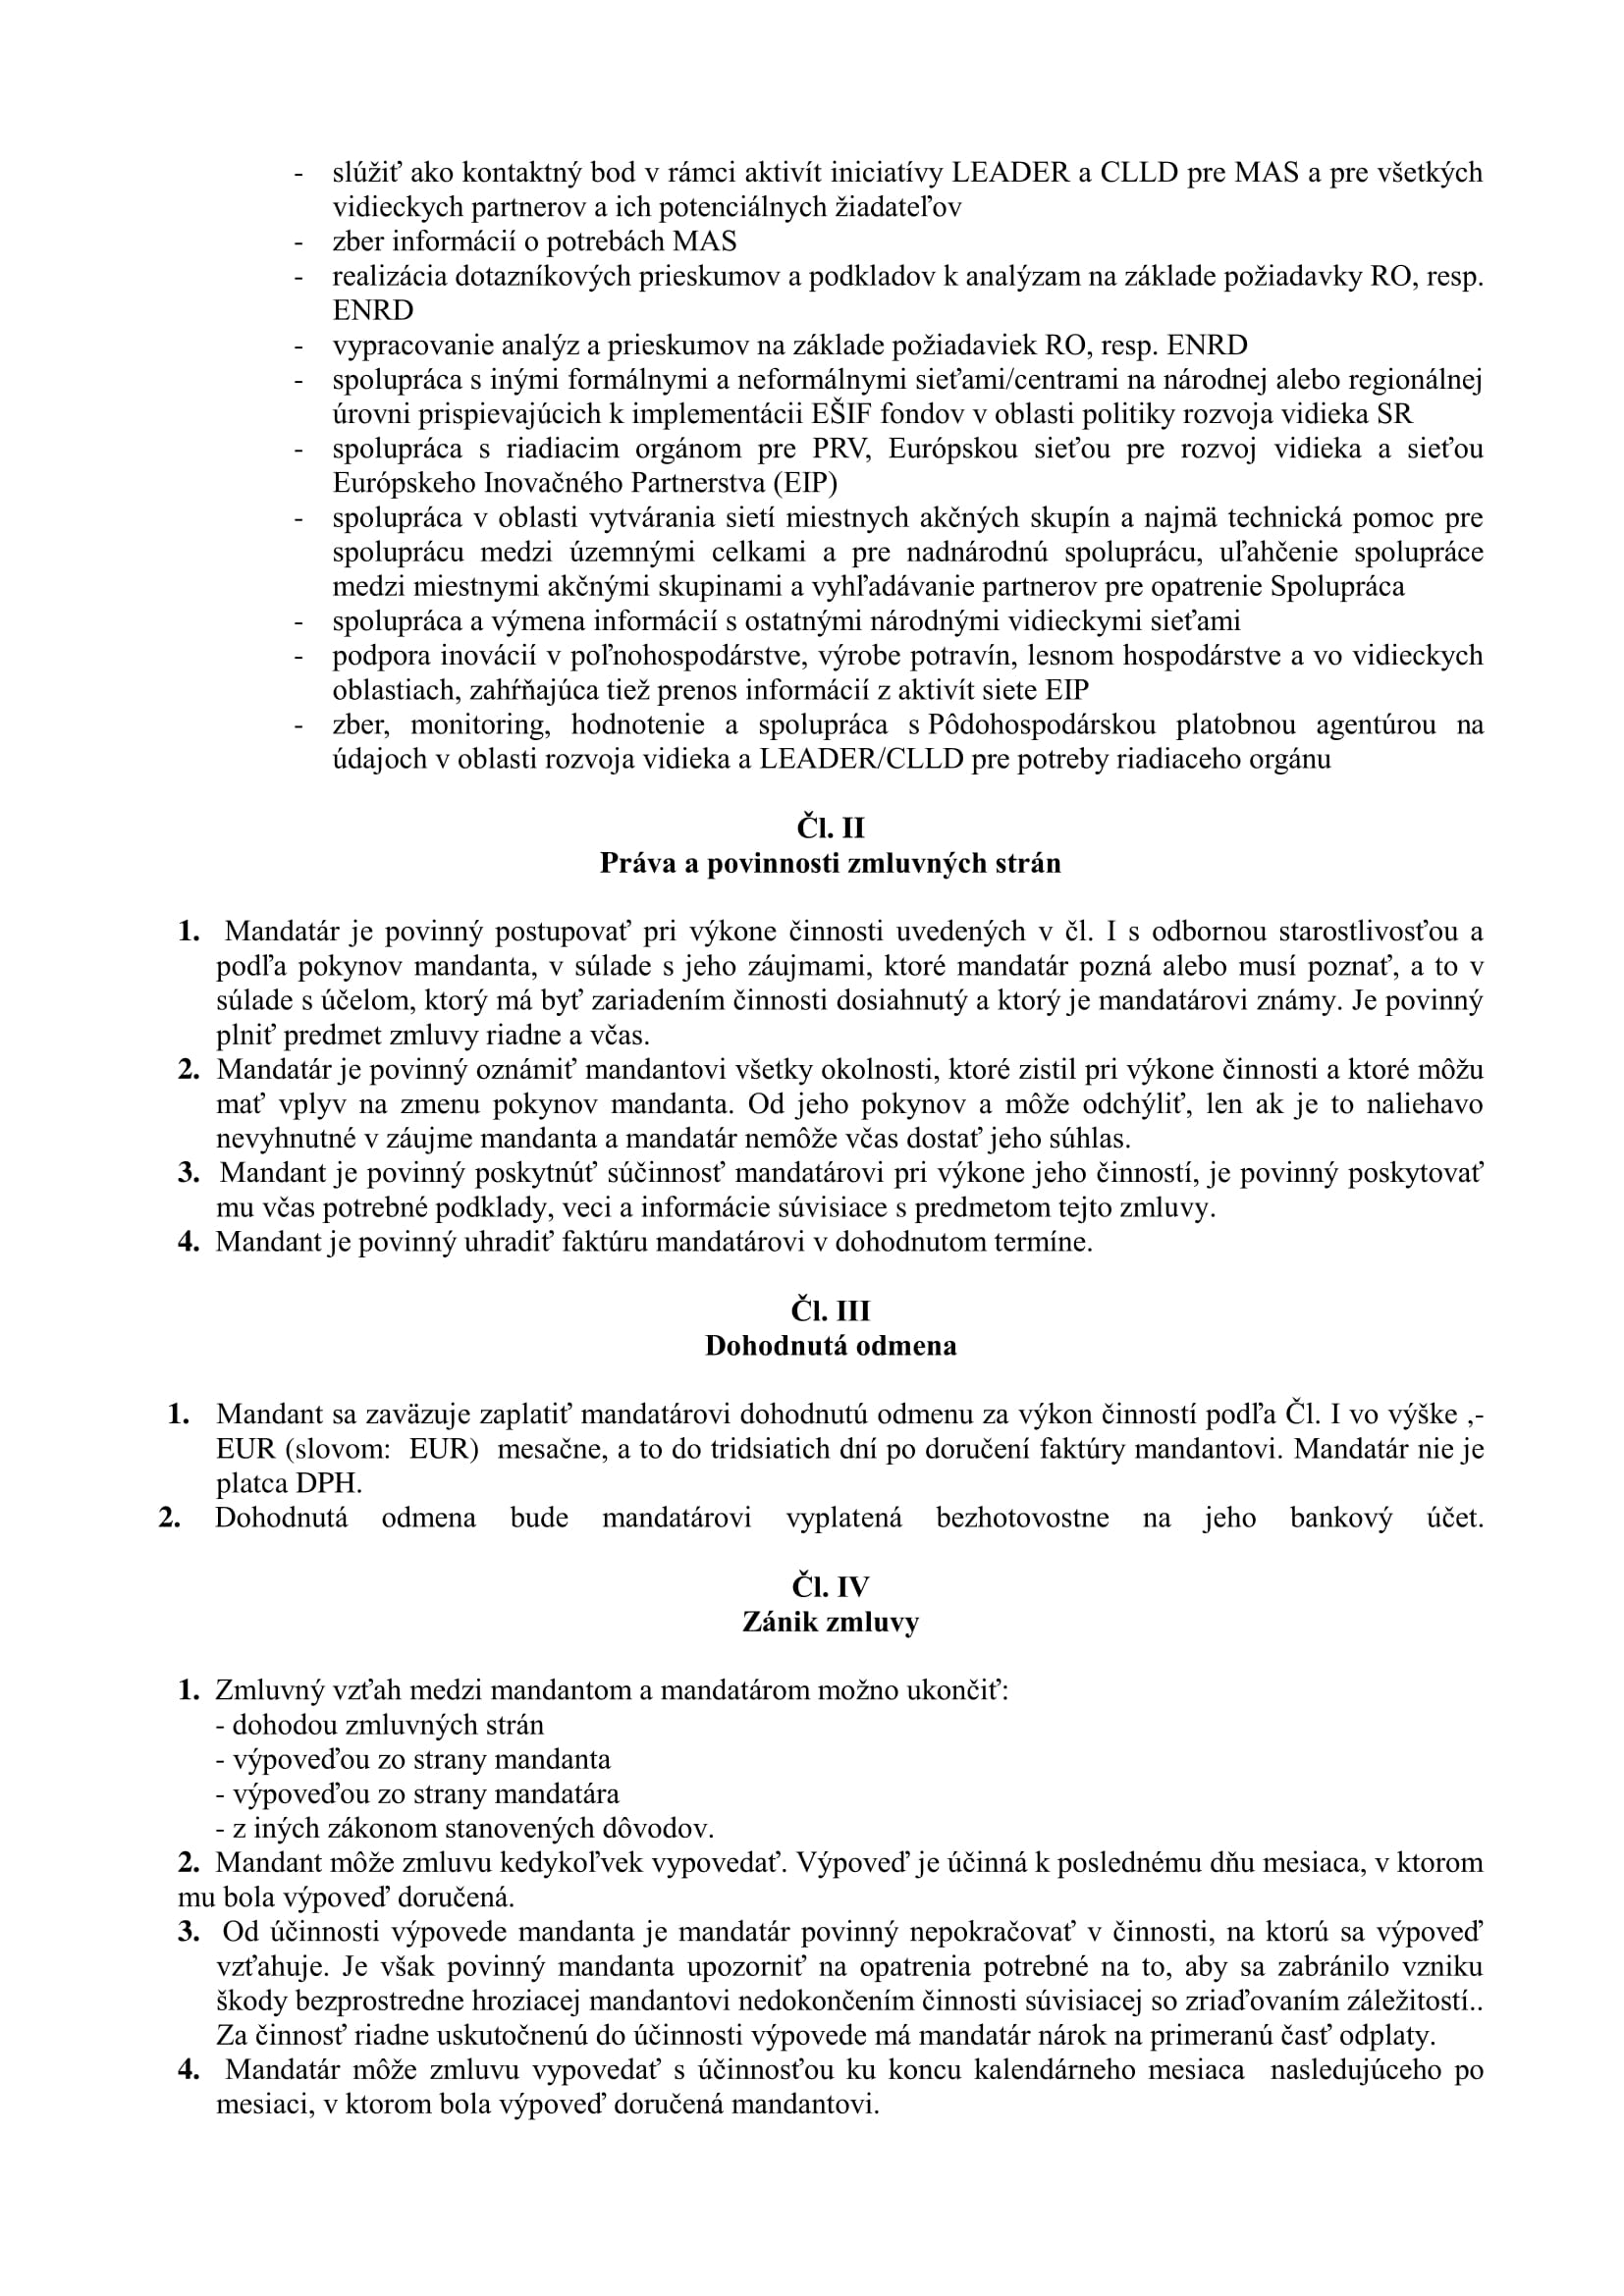 priloha-c-3-mandatna-zmluva-2